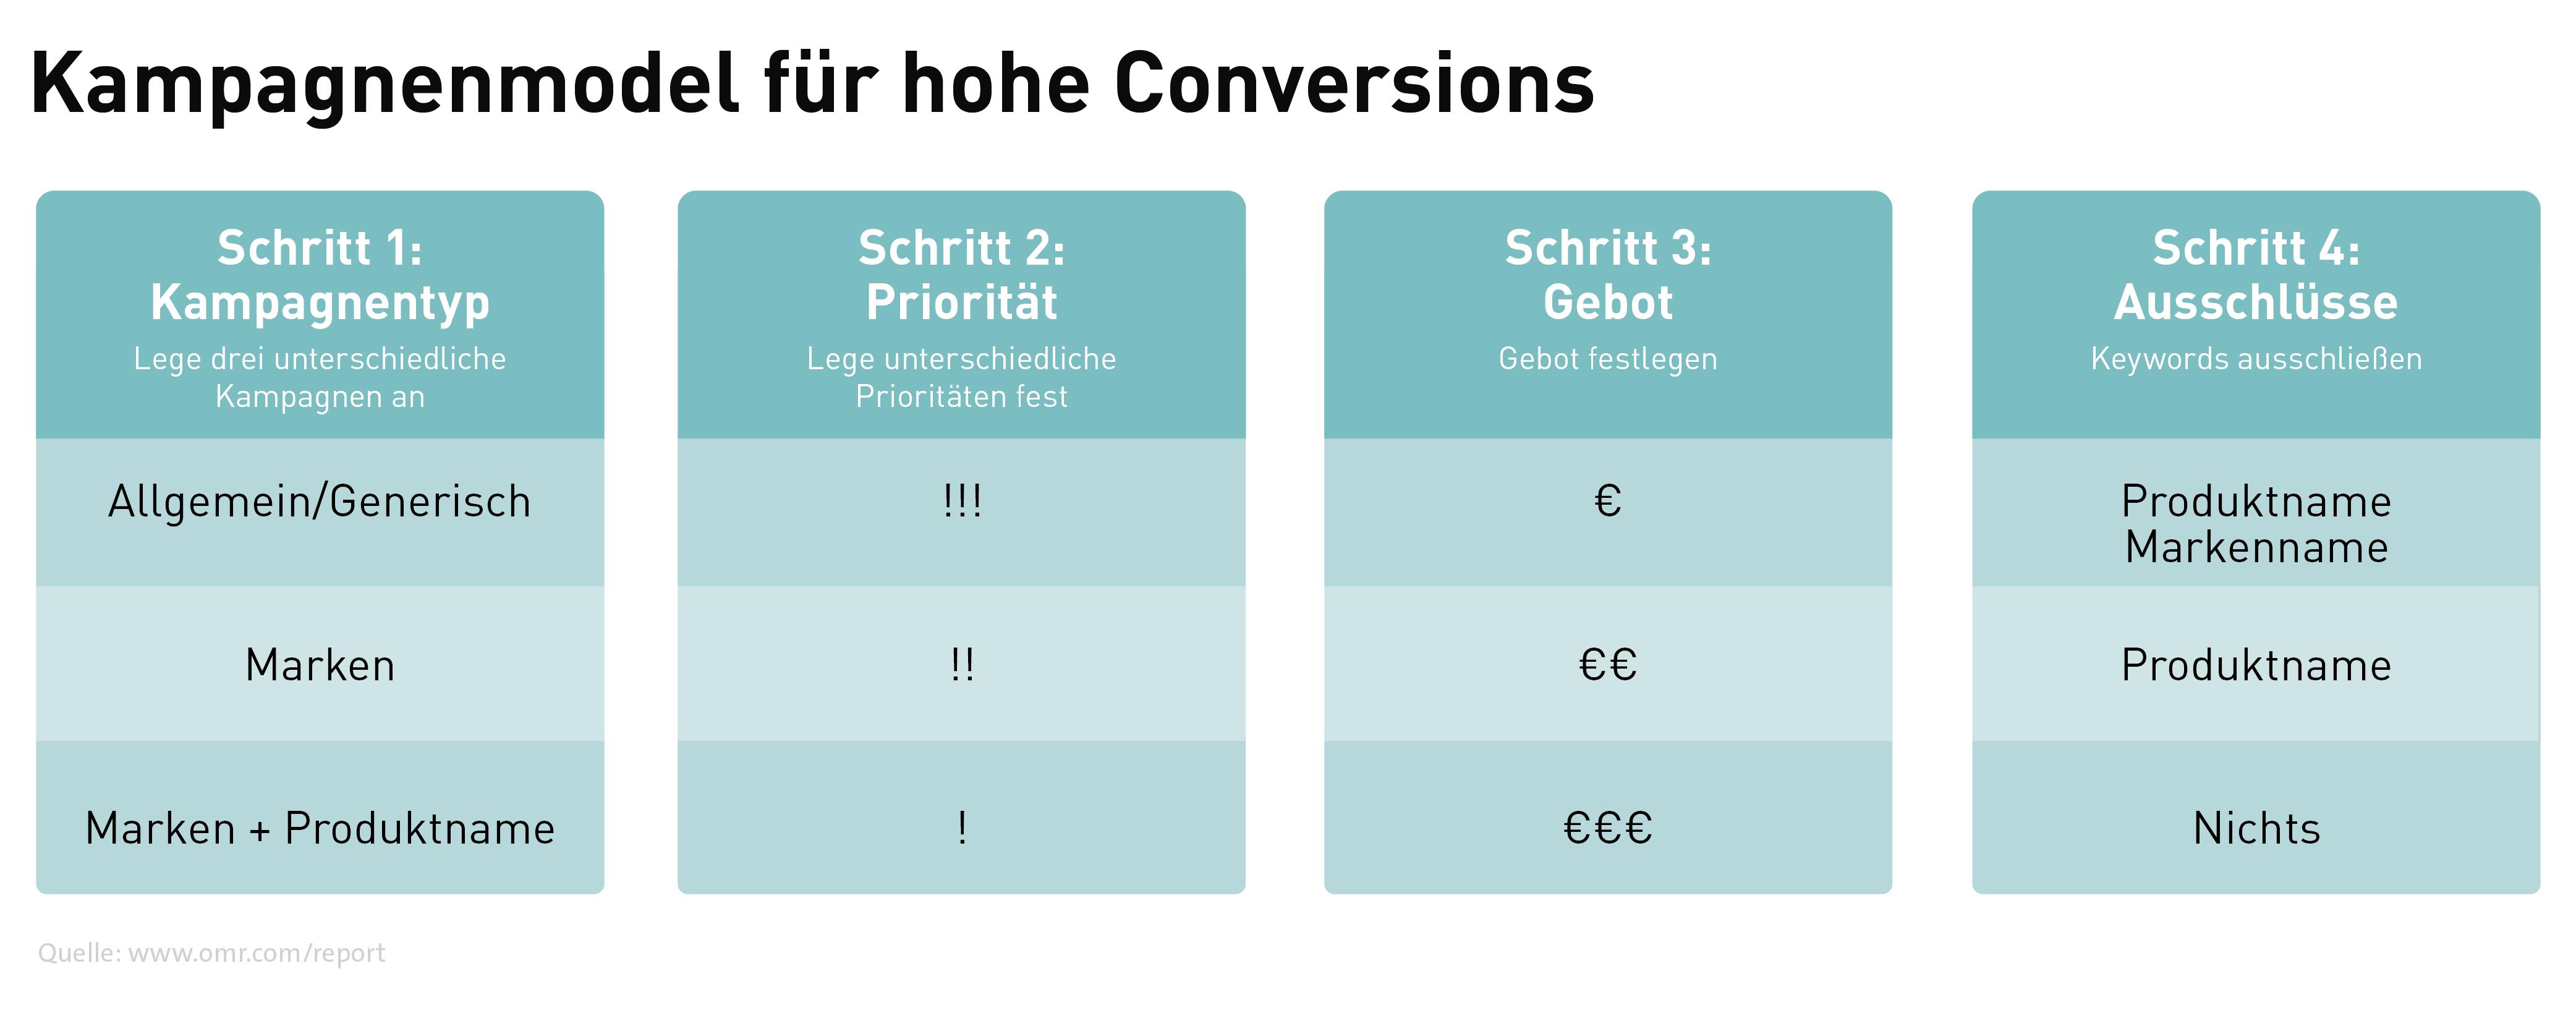 Kampagnenmodel für hohe Conversions